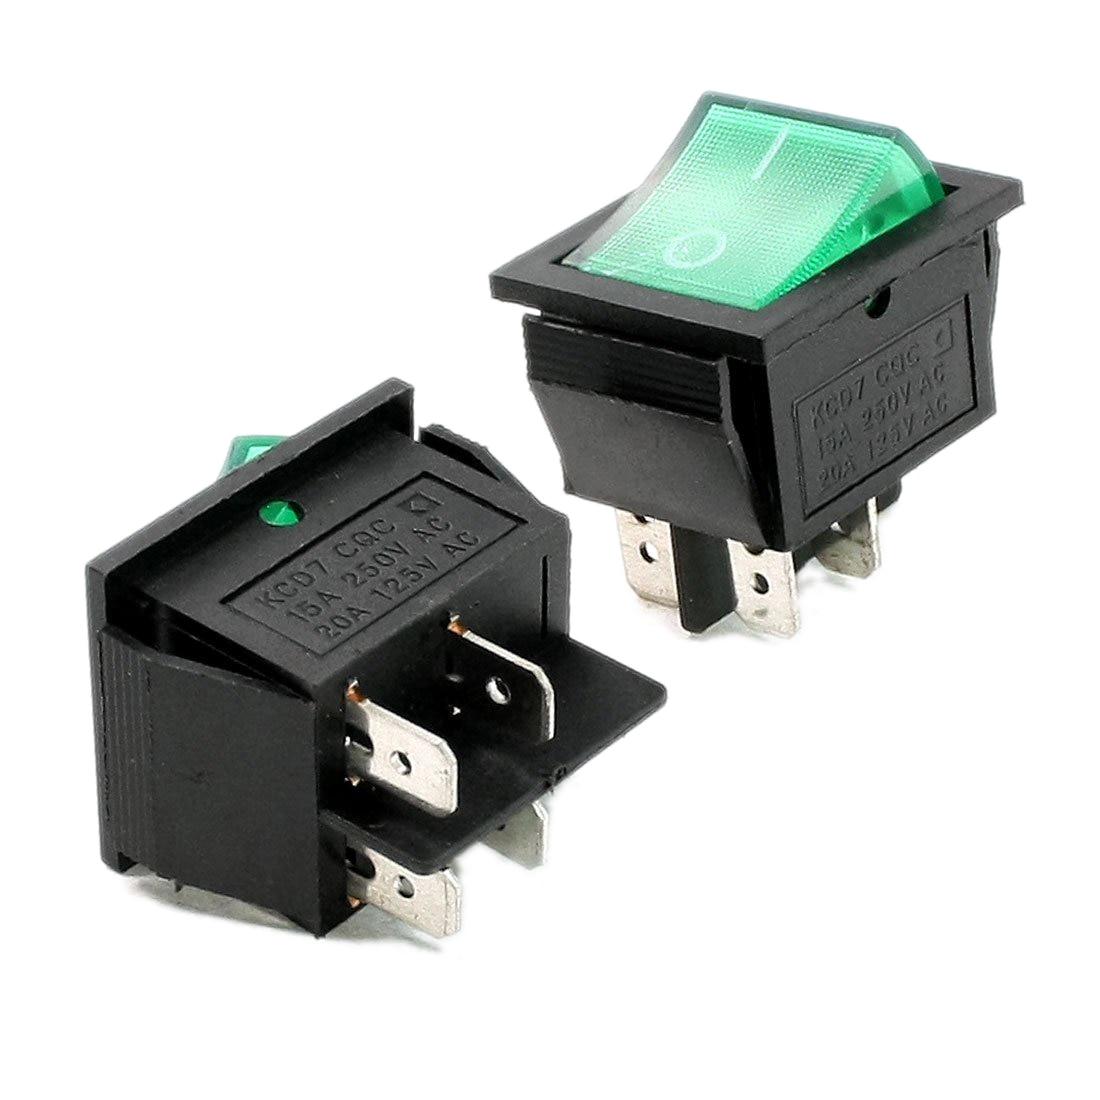 2 Pcs Green Illuminated Light On/Off Boat Rocker Switch AC 10A 250V/20A 125V